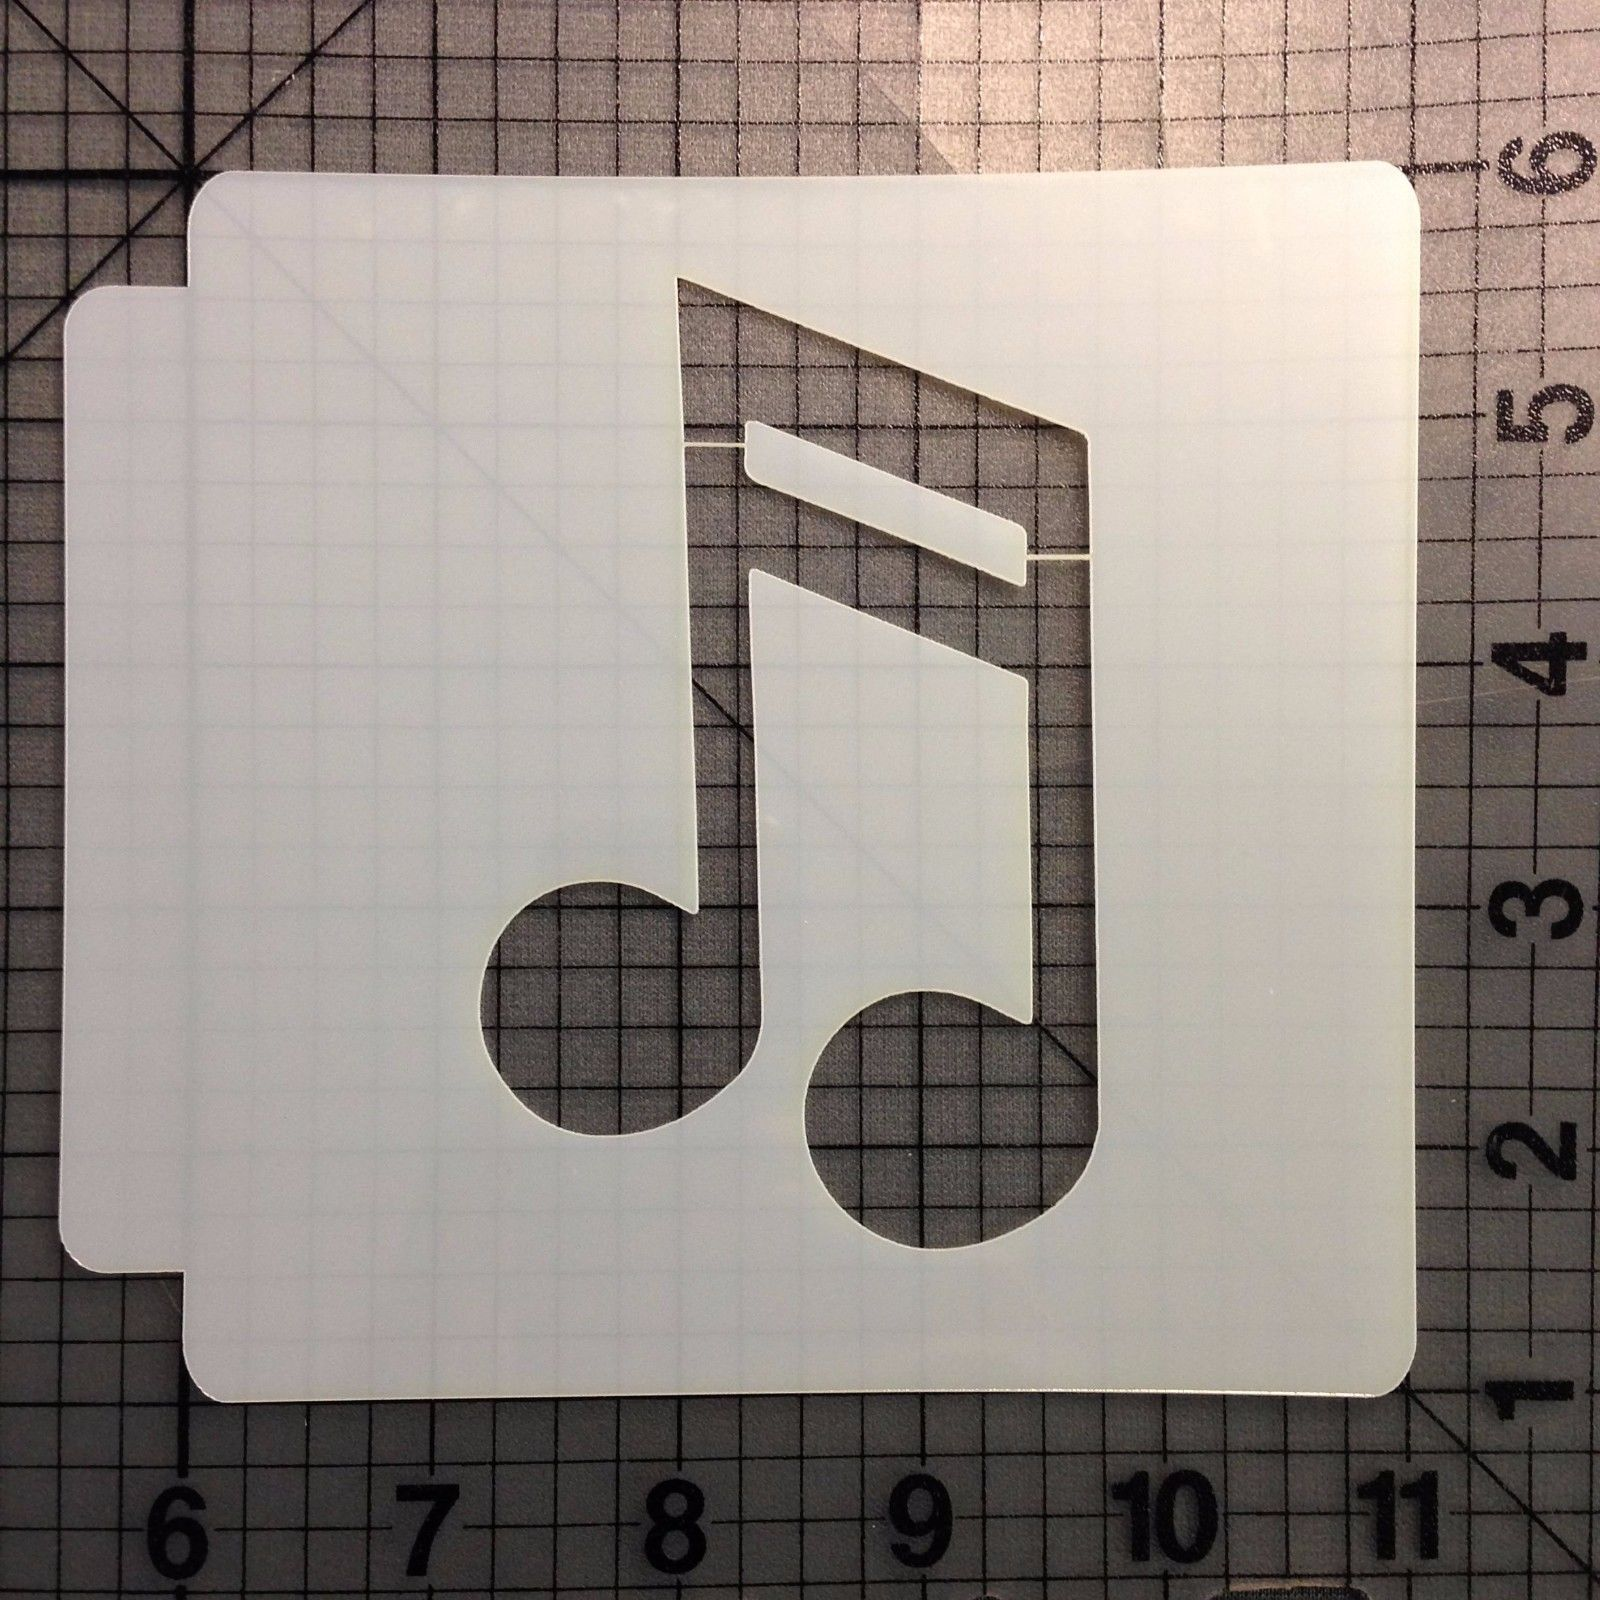 Music Note Stencil 102 - $3.50 - $15.50